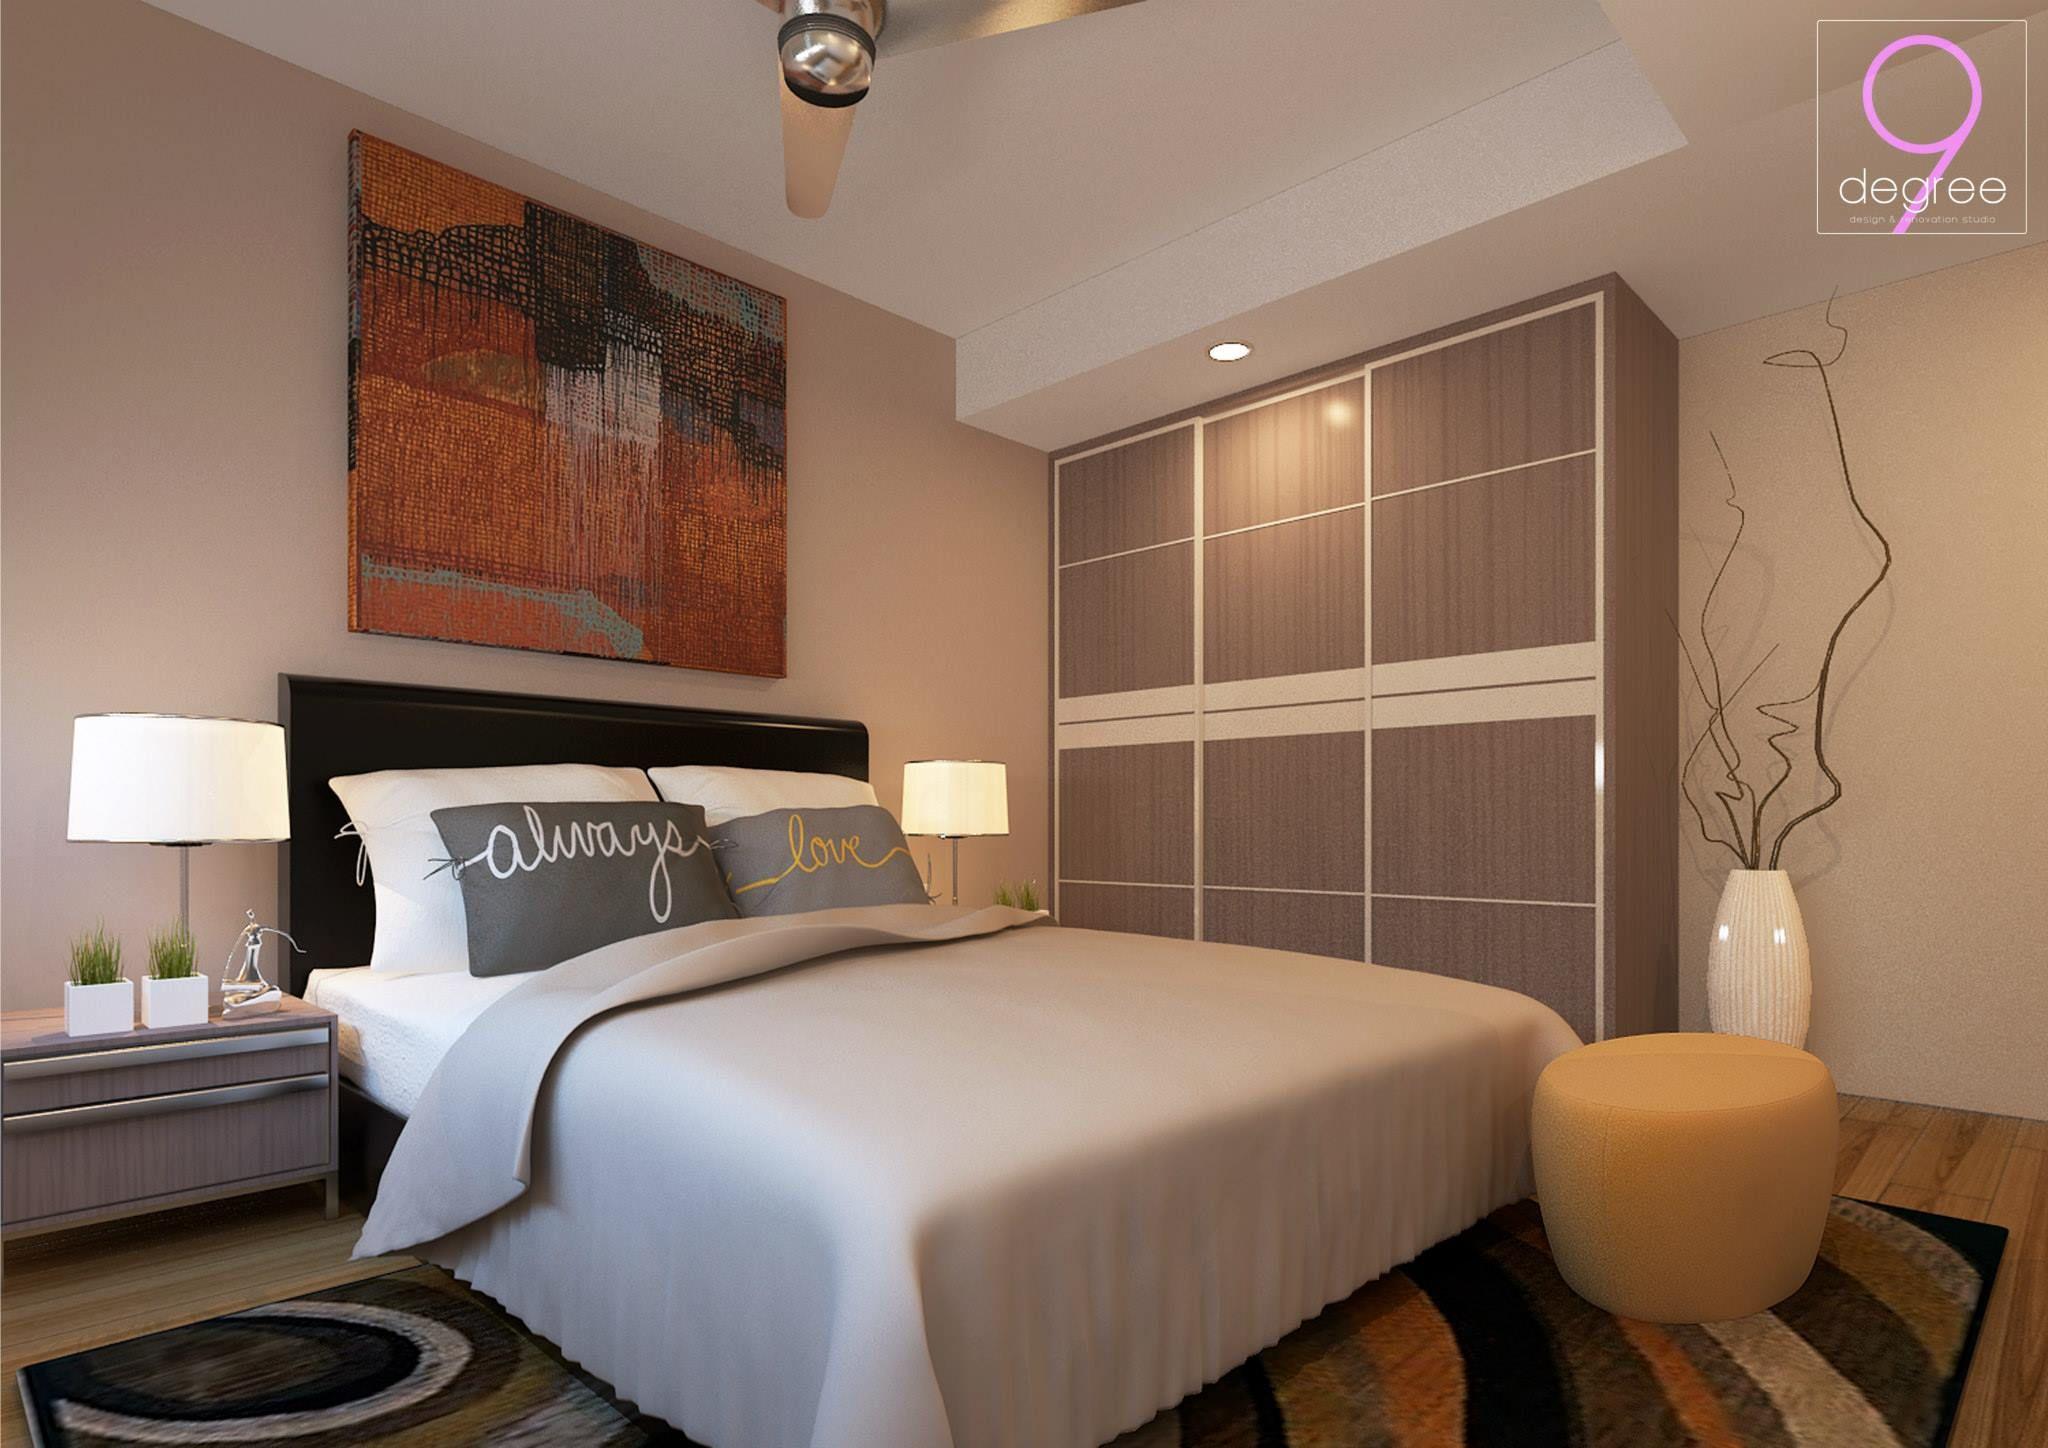 Master Bedroom Home Idea Pinterest Master bedroom Bedrooms